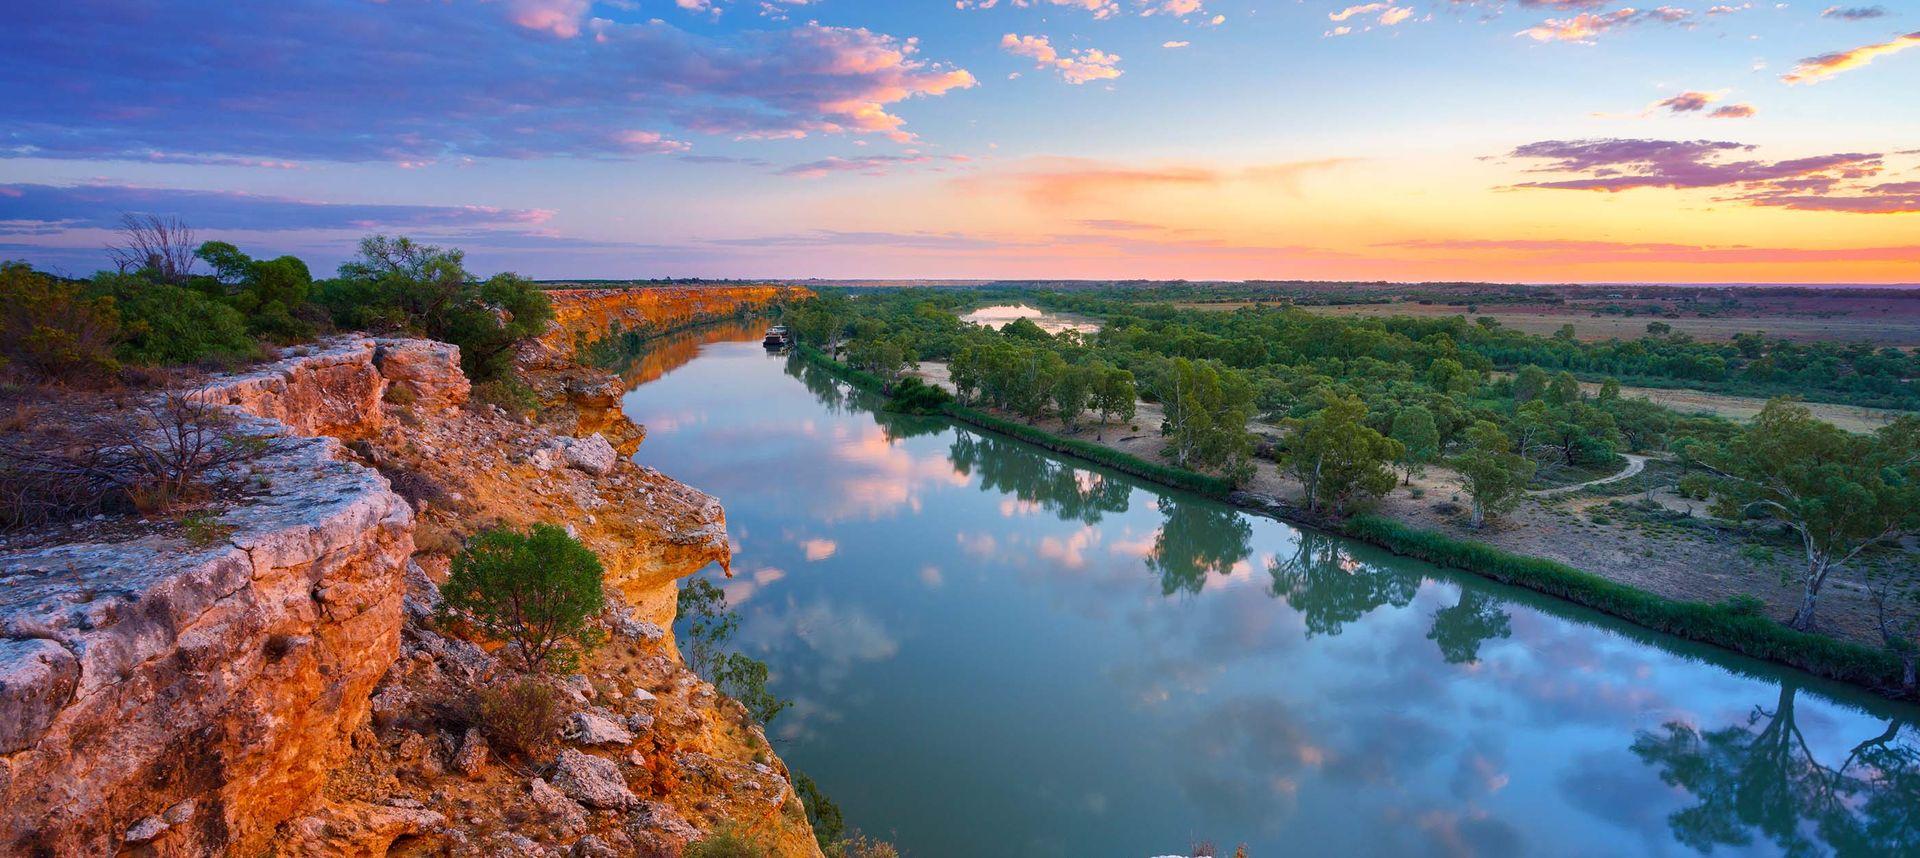 The Murray River, South Australia (Shutterstock)